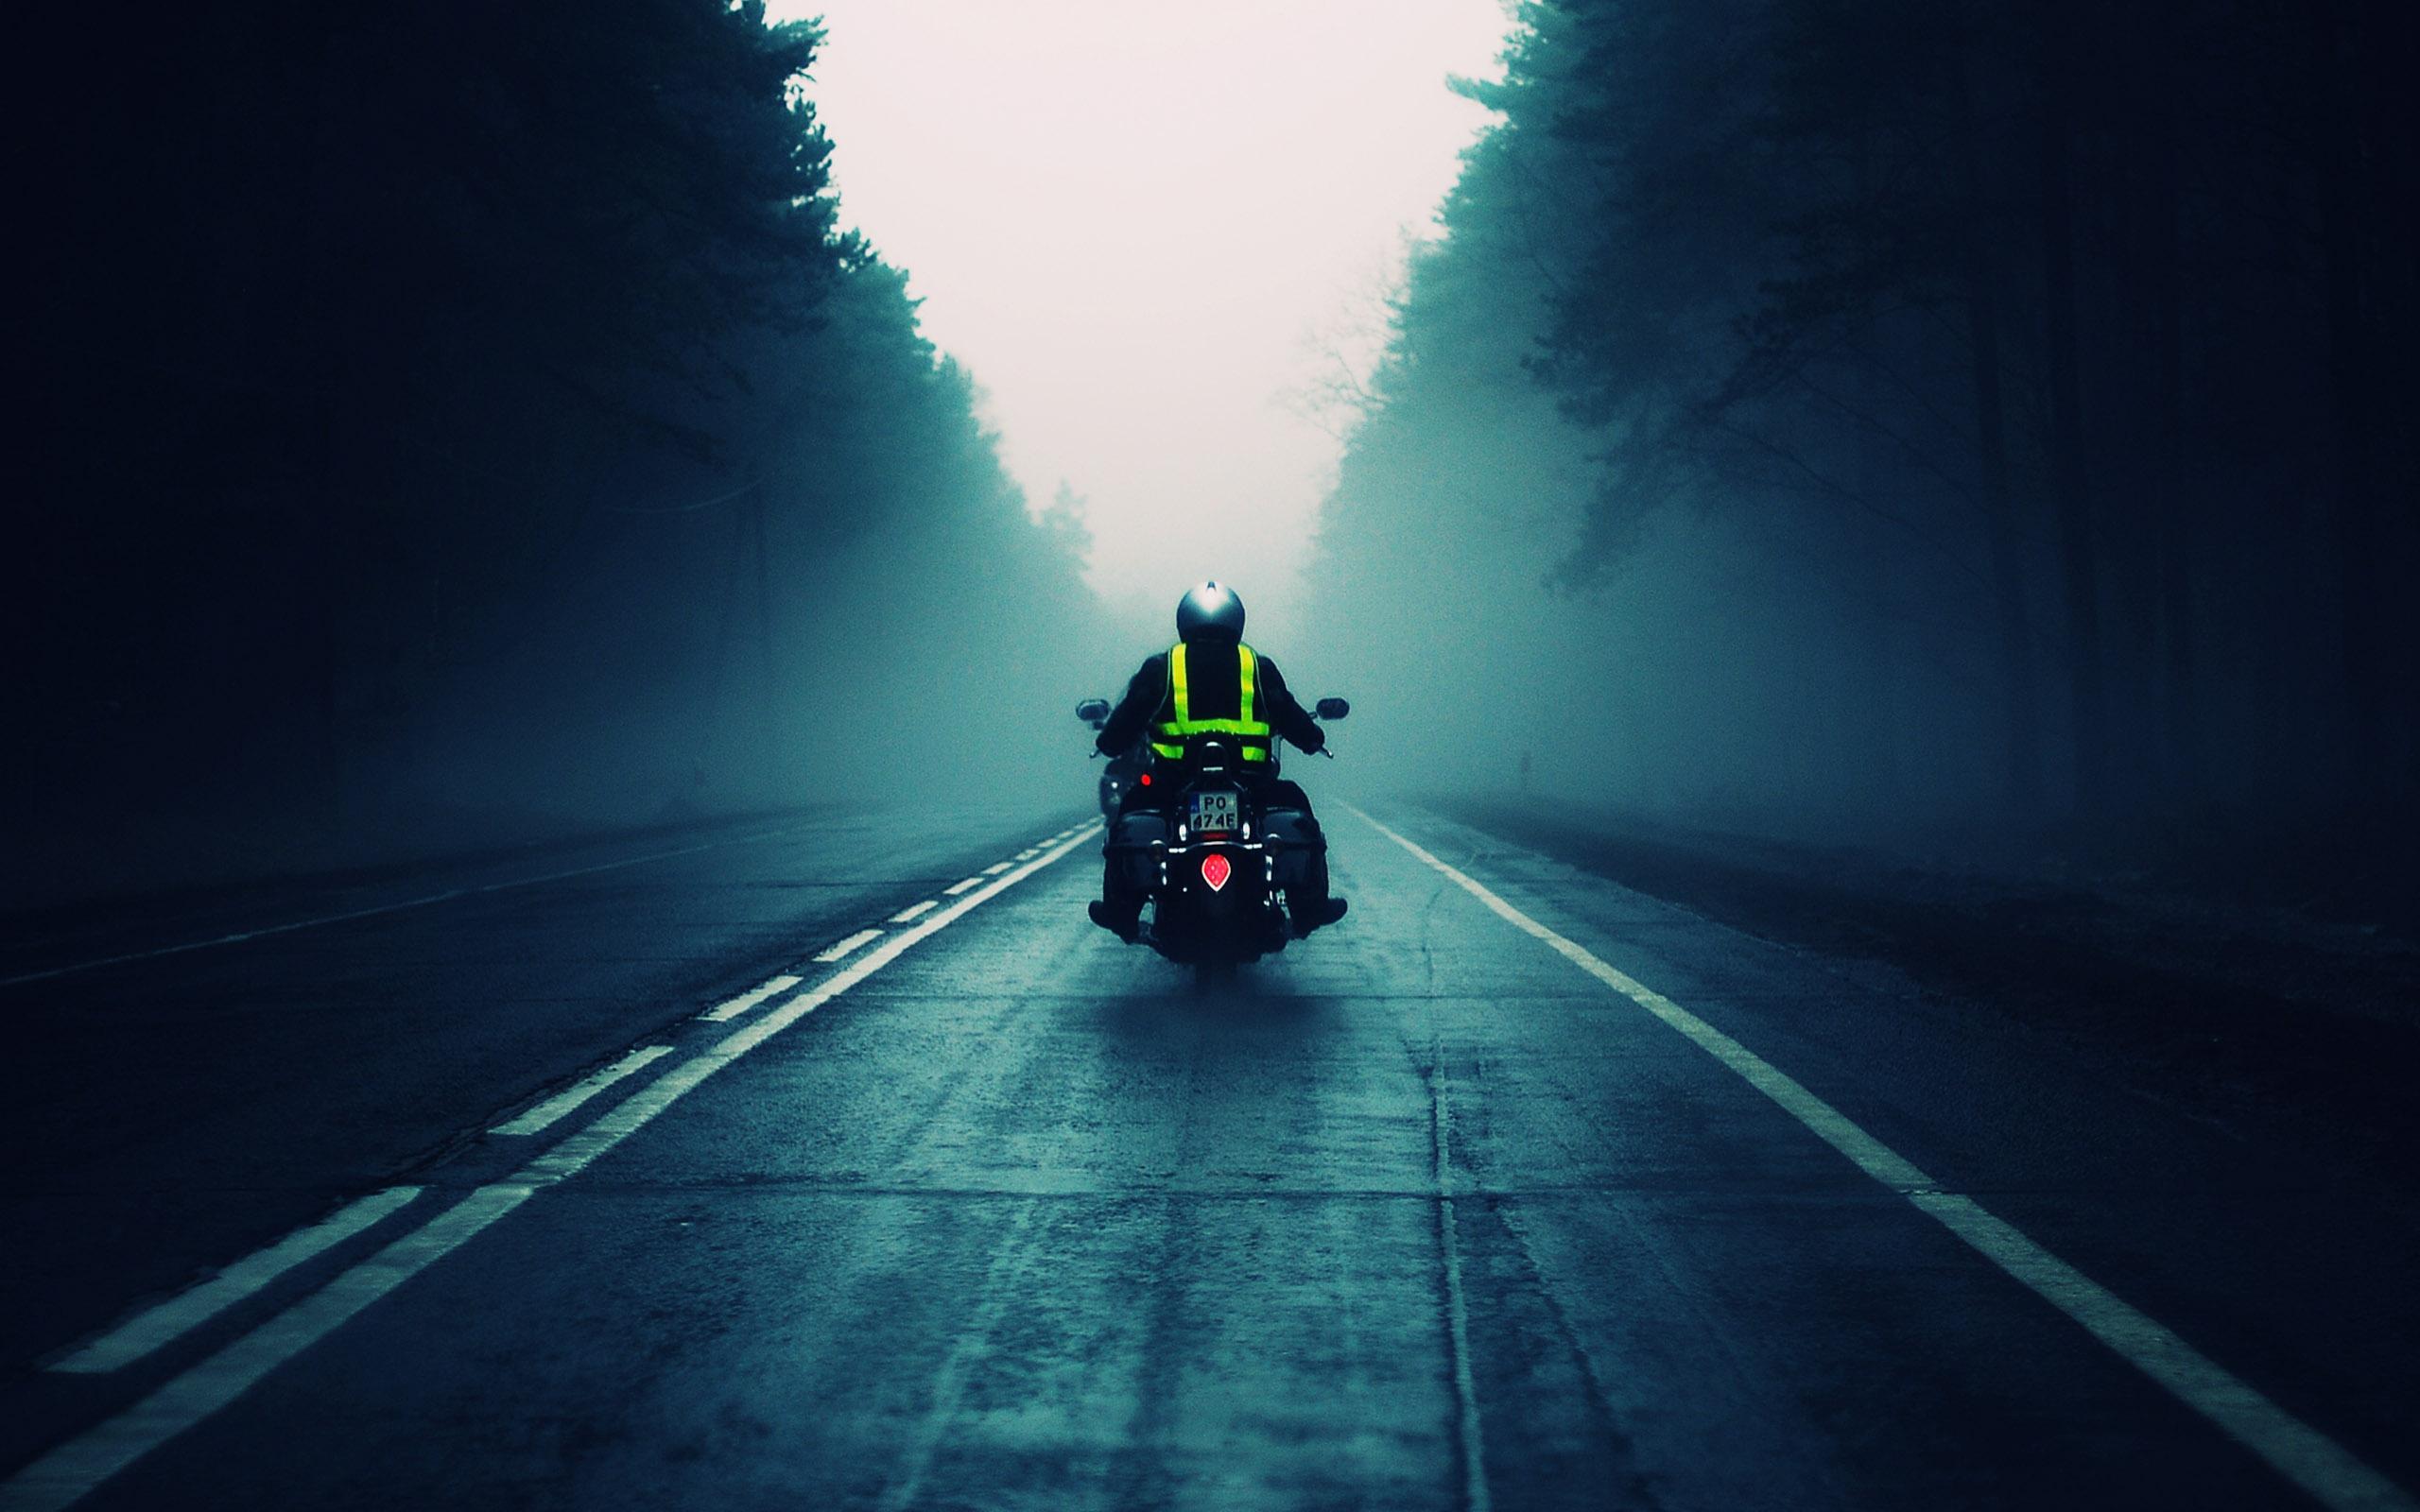 Motorcycle Patrol on Apple Mac Desktop Wallpapers HD HD Desktop Ride 2560x1600